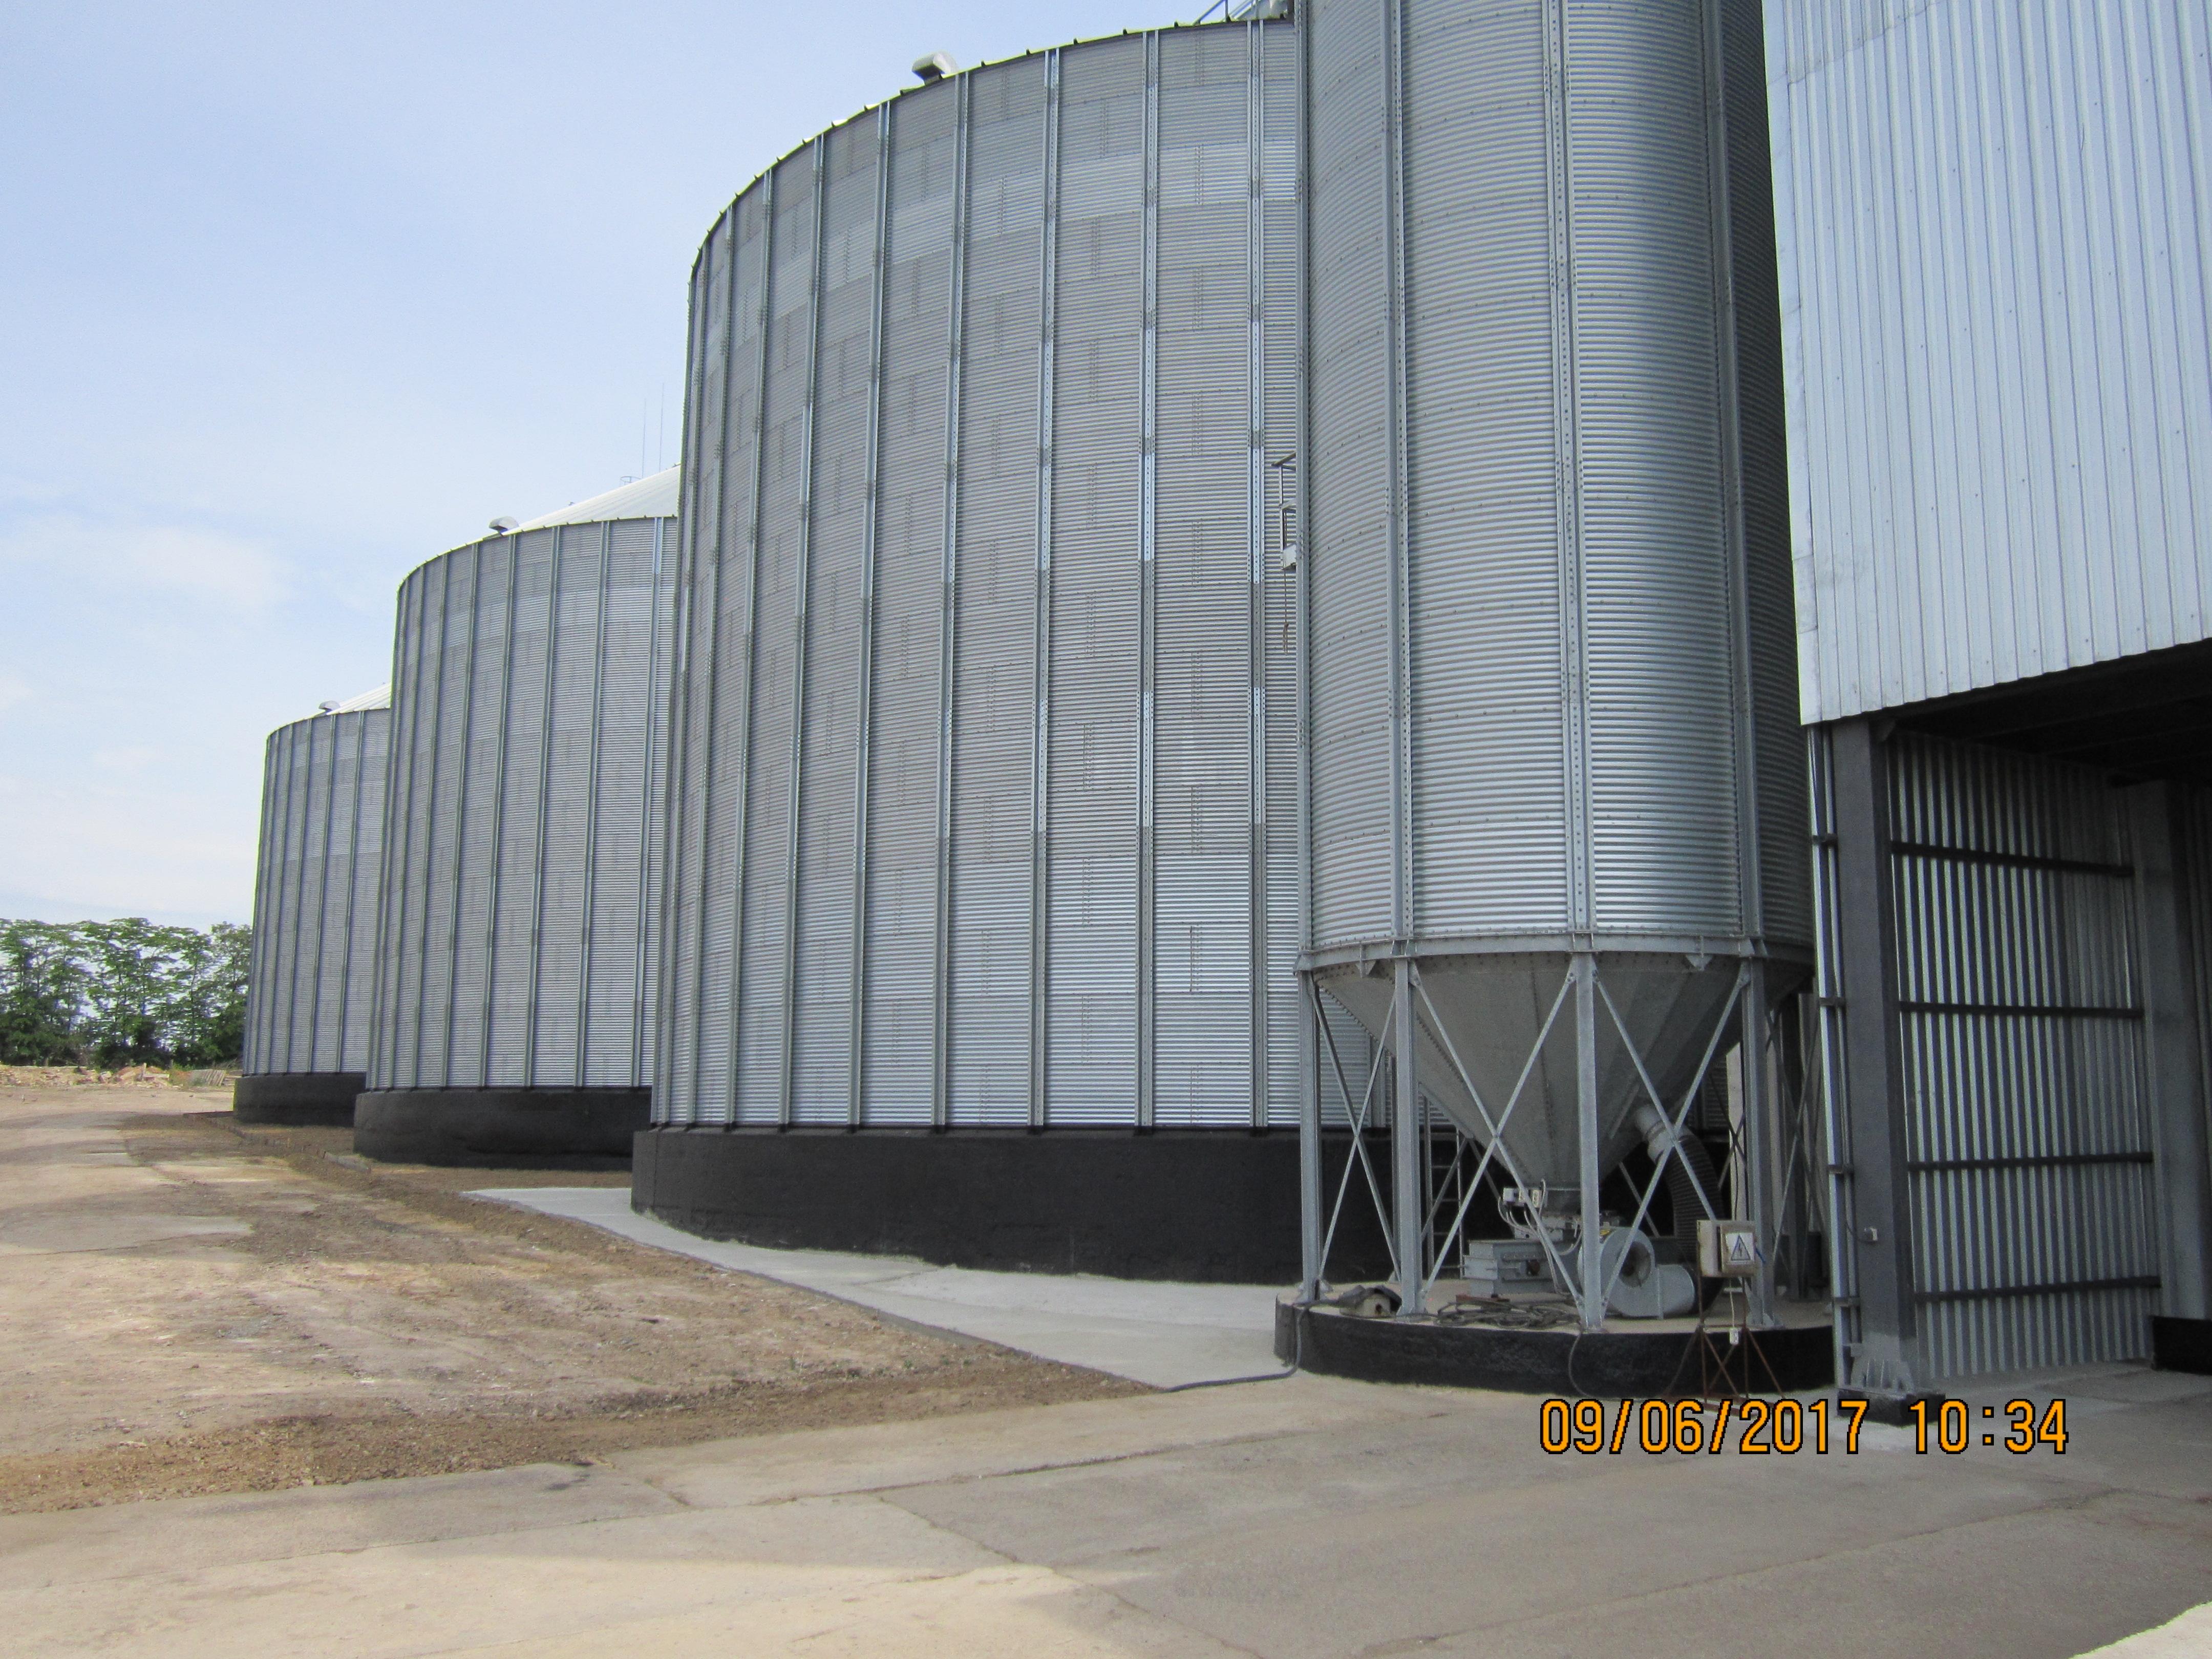 Ціни на зерно, соняшник, кукурудзу (на 09.06.2017)